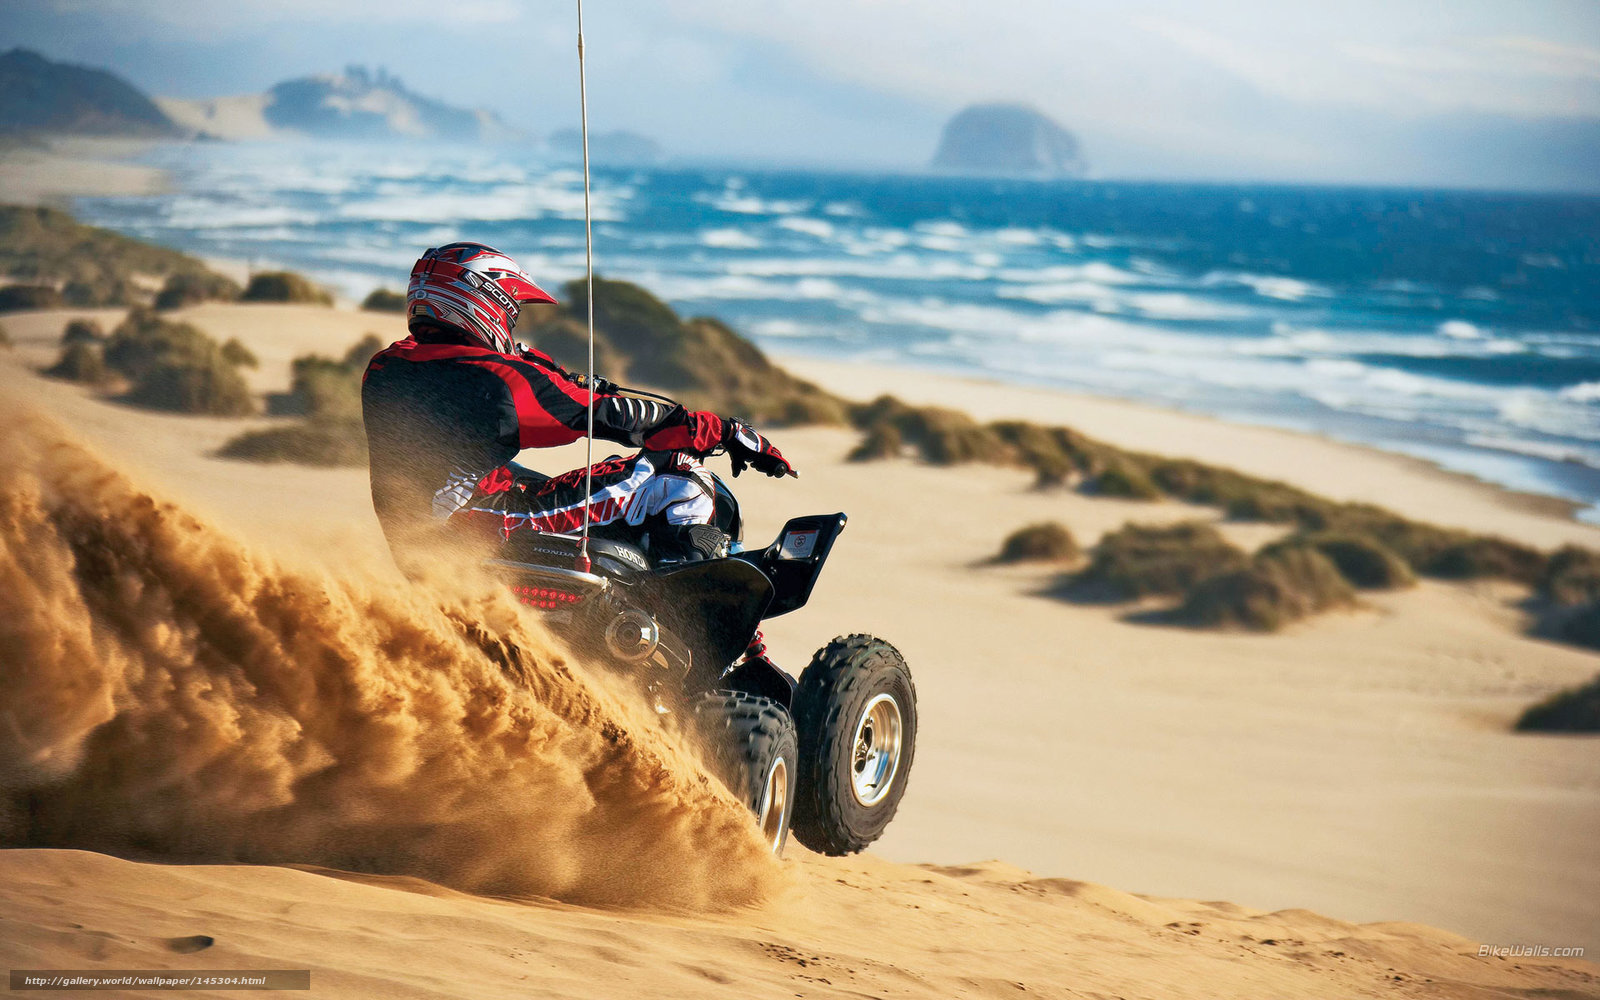 Motorcycle Racing On The Sand Suzuki Hd Desktop Mobile: Download Wallpaper Honda, ATV, TRX450R, 2006 TRX450R Free